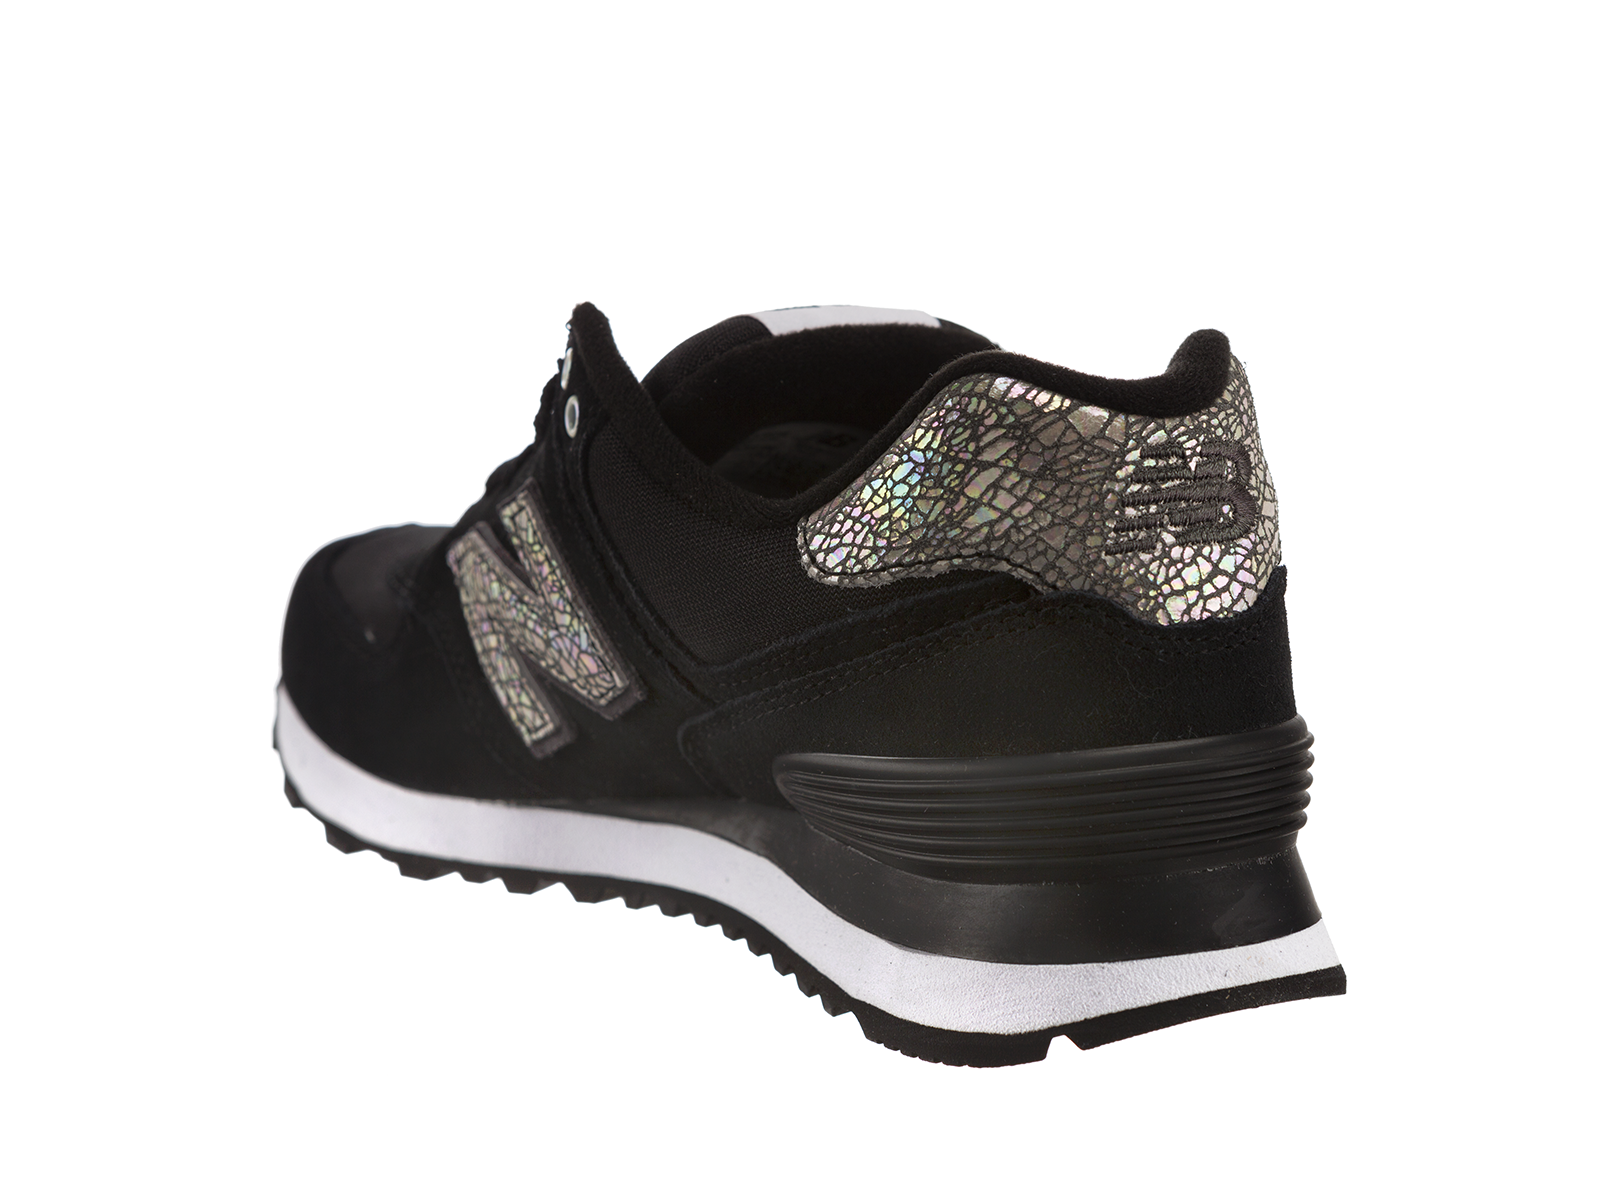 new balance u520 herren damen sneakers turnschuhe schuhe. Black Bedroom Furniture Sets. Home Design Ideas